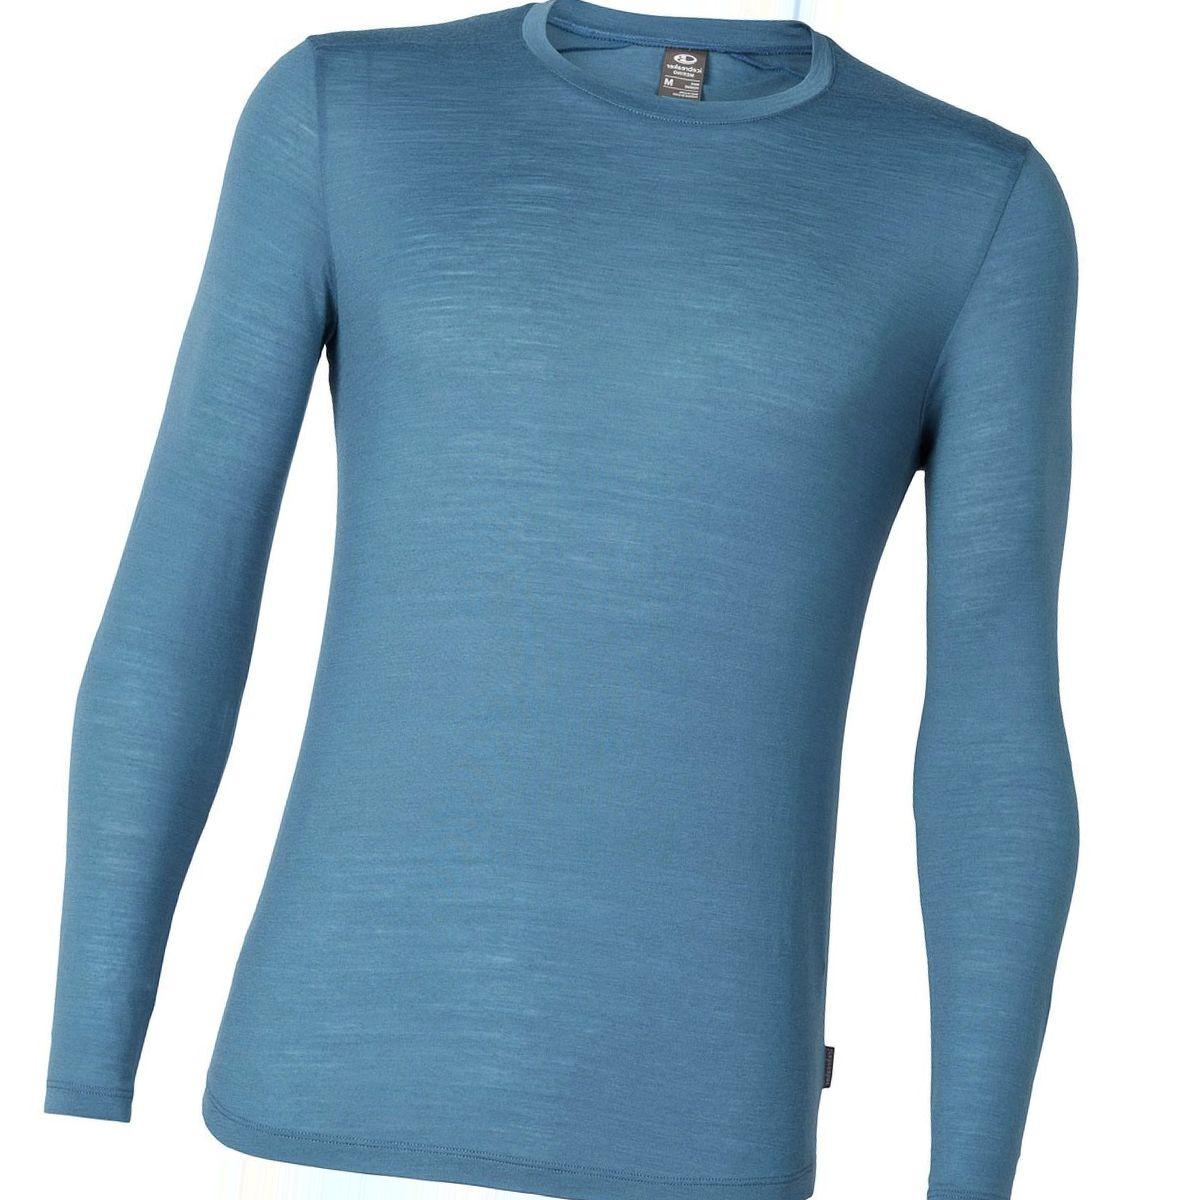 Icebreaker Sphere Long-Sleeve Crewe Shirt - Men's